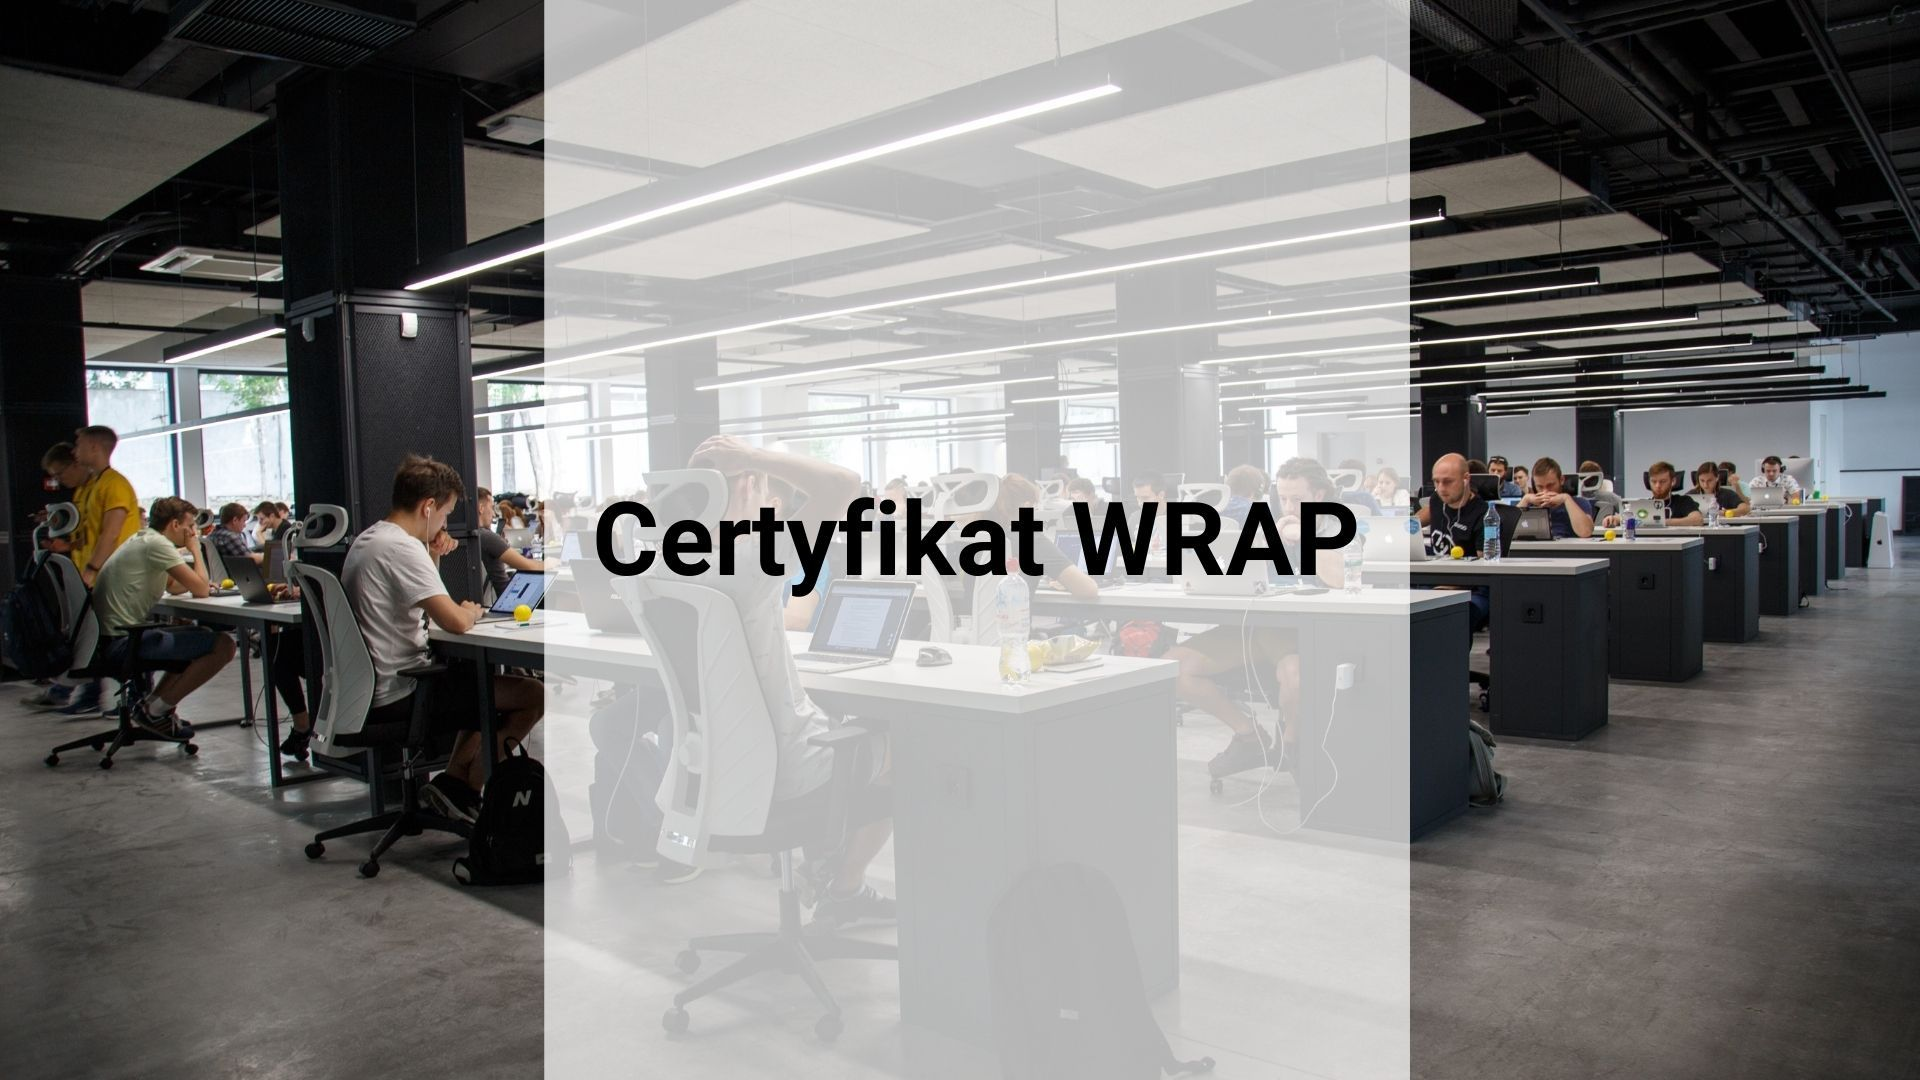 certyfikat wrap